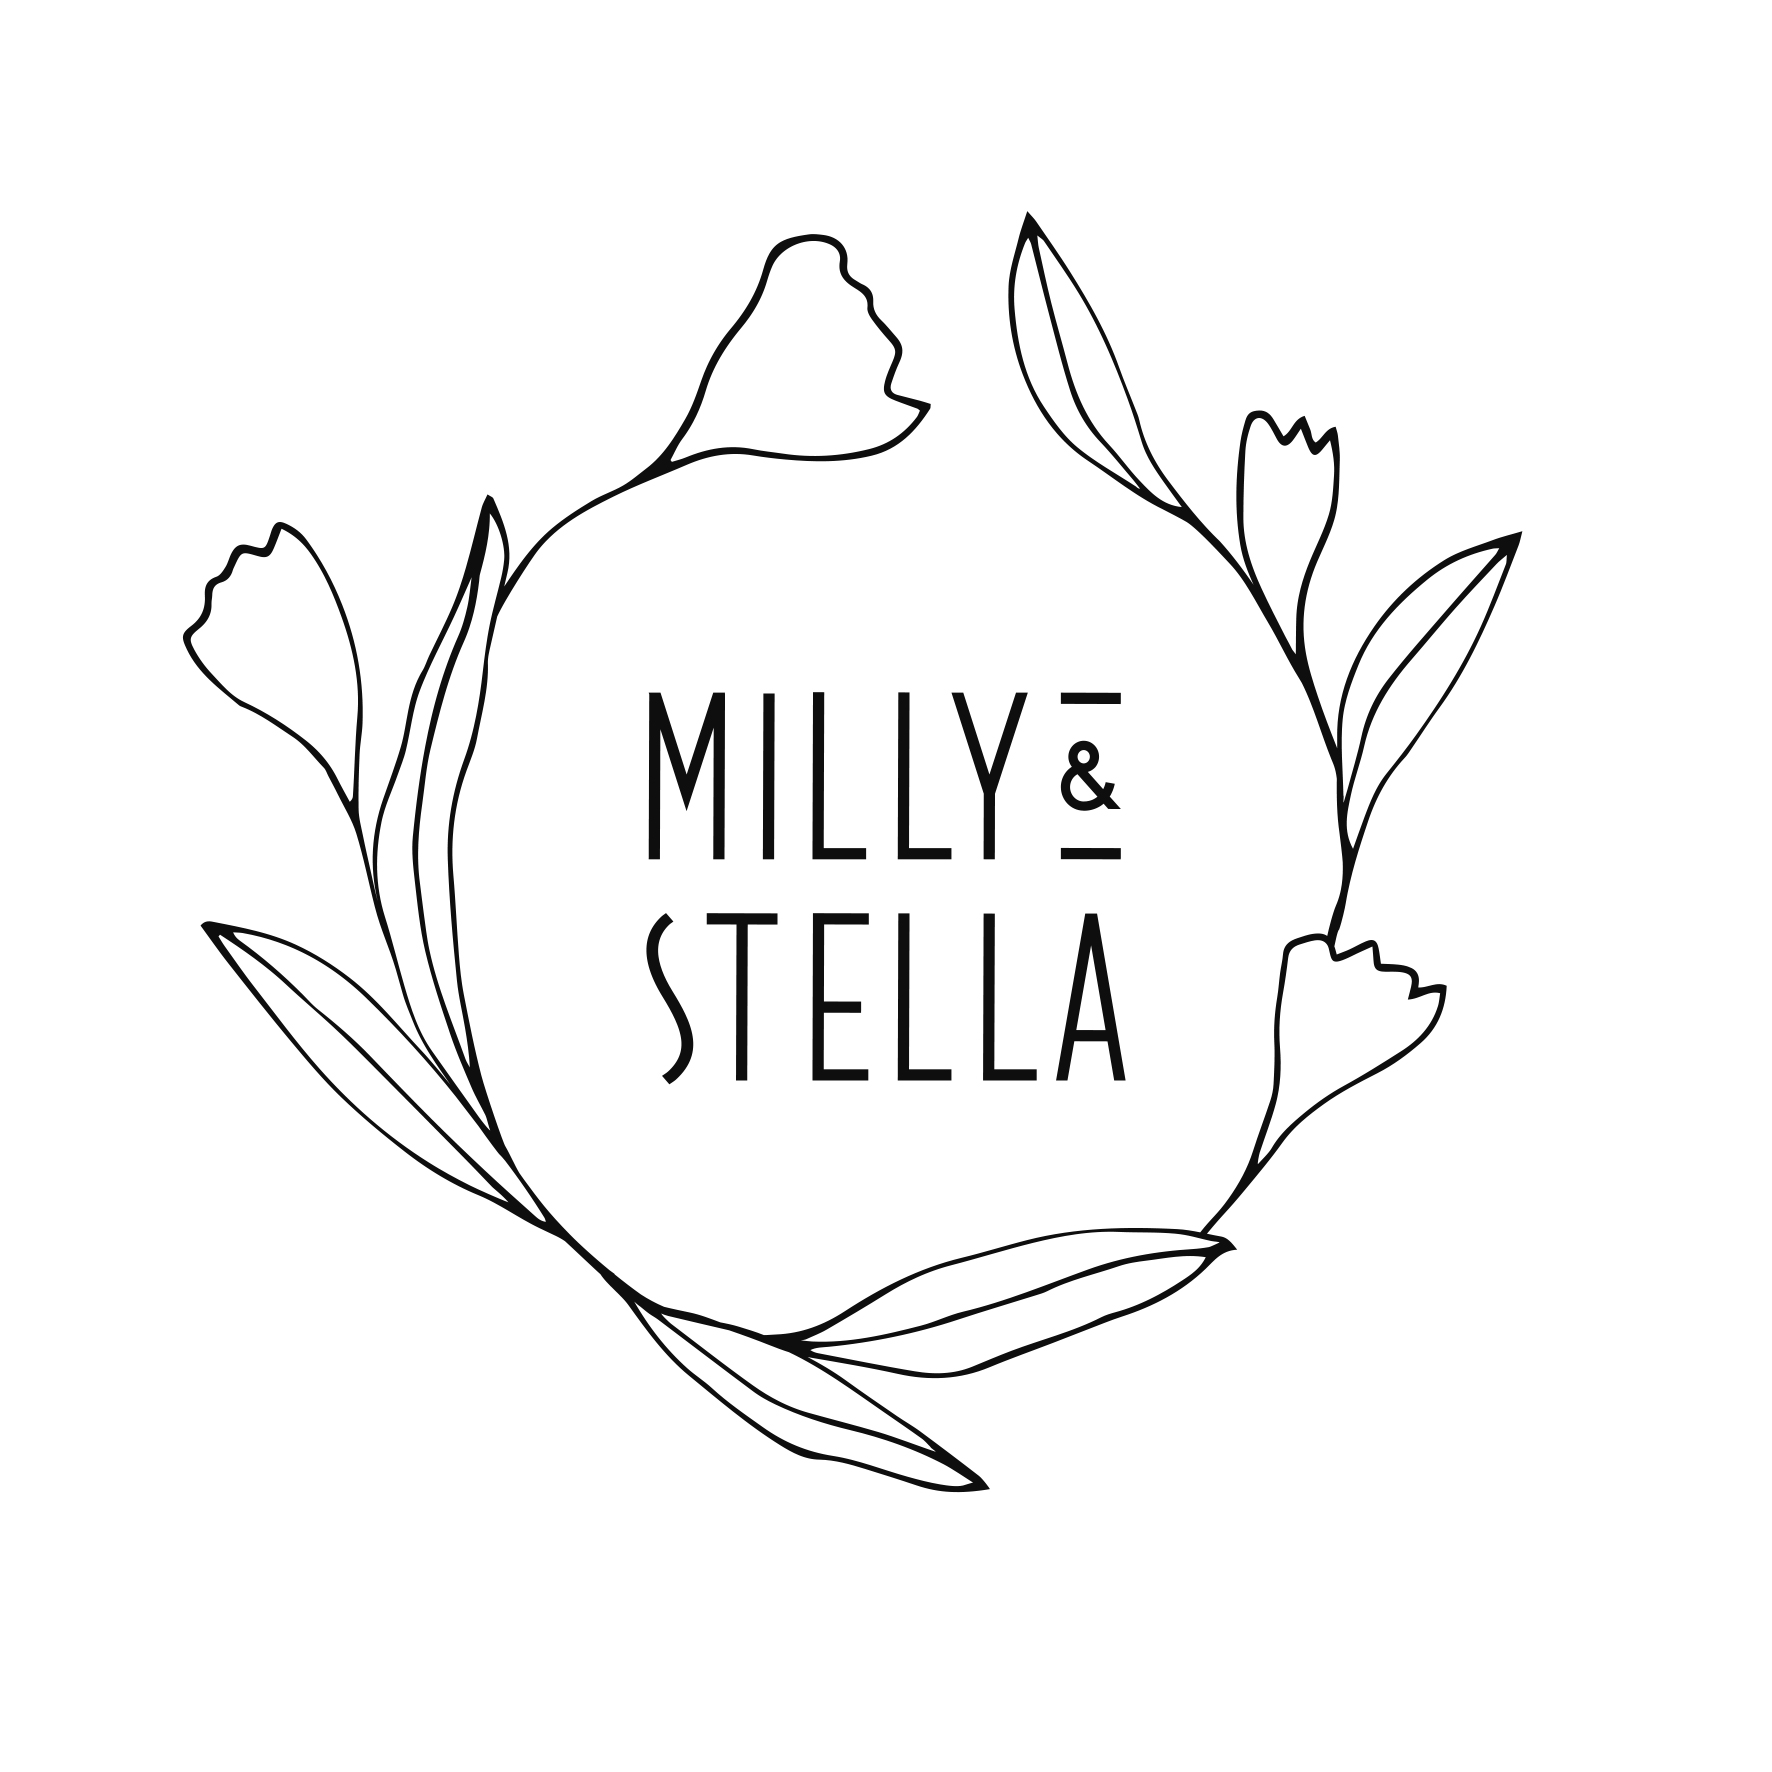 Milly & Stella